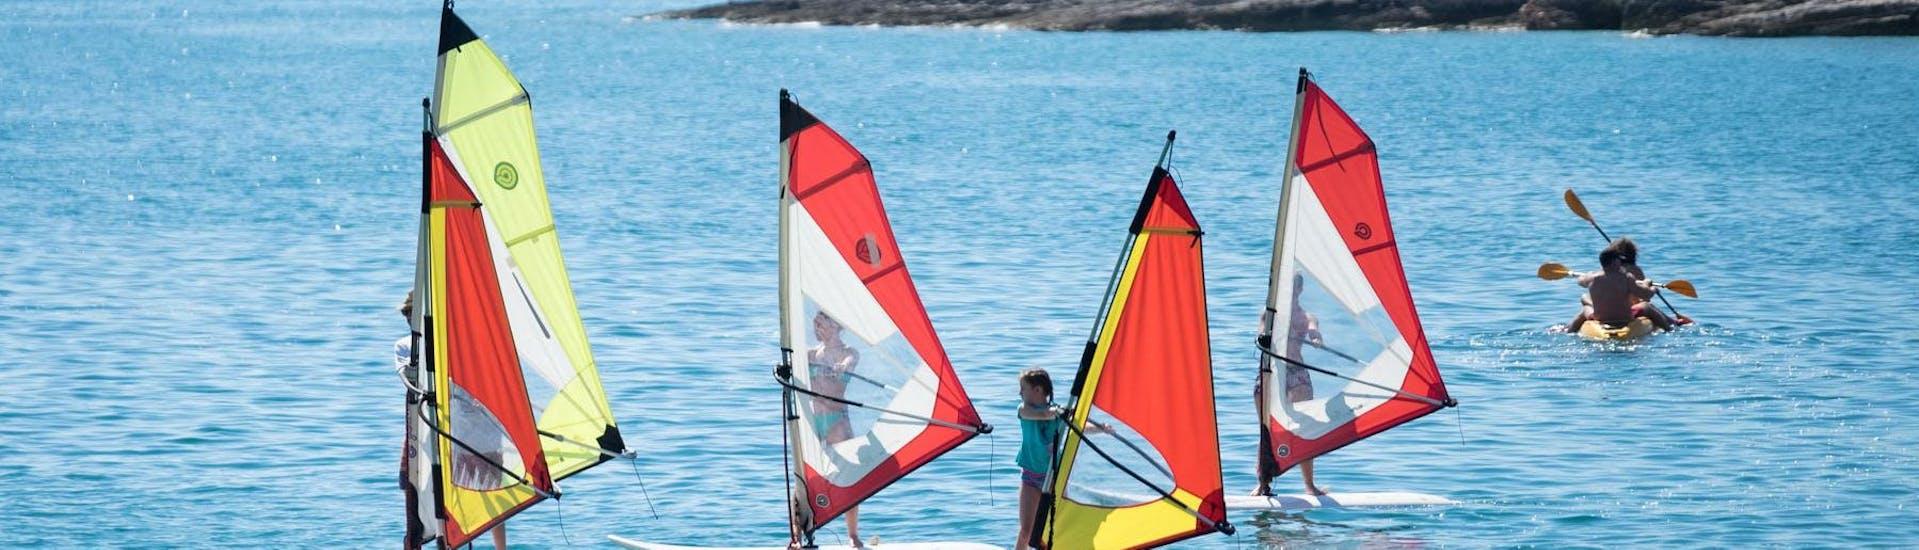 Windsurfing Lessons for Beginners - Školjić Beach